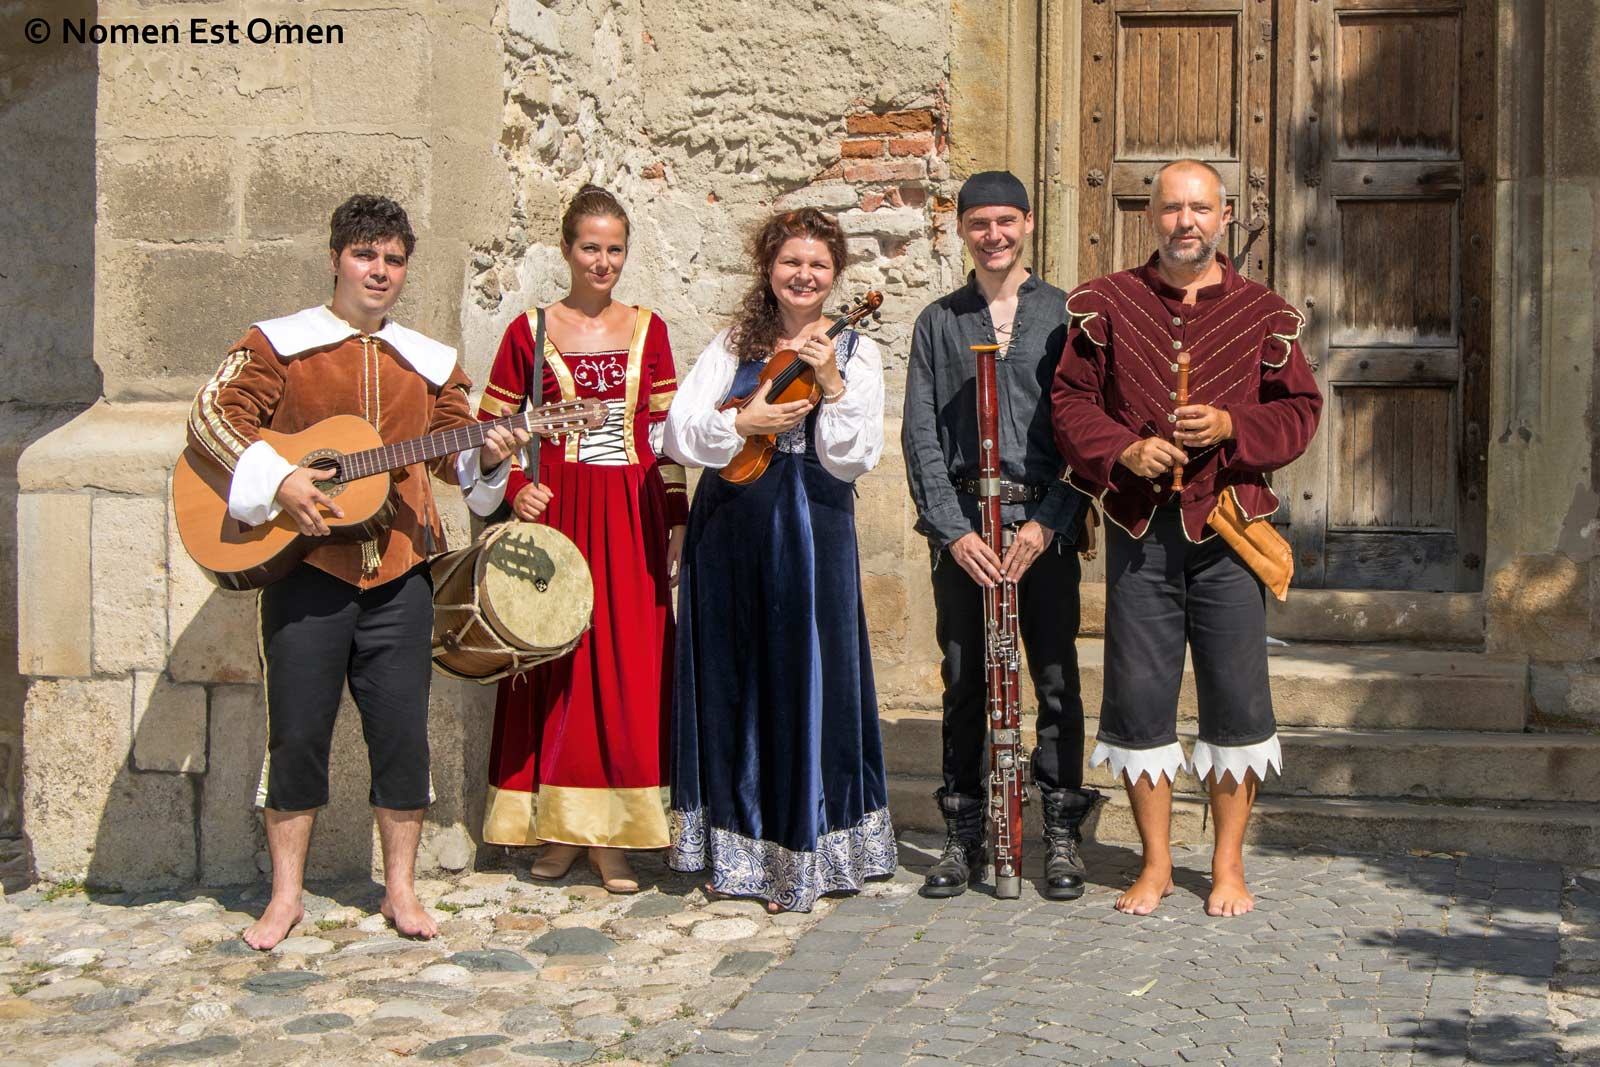 Nomen Est Omen Sibiu Cetati Transilvane